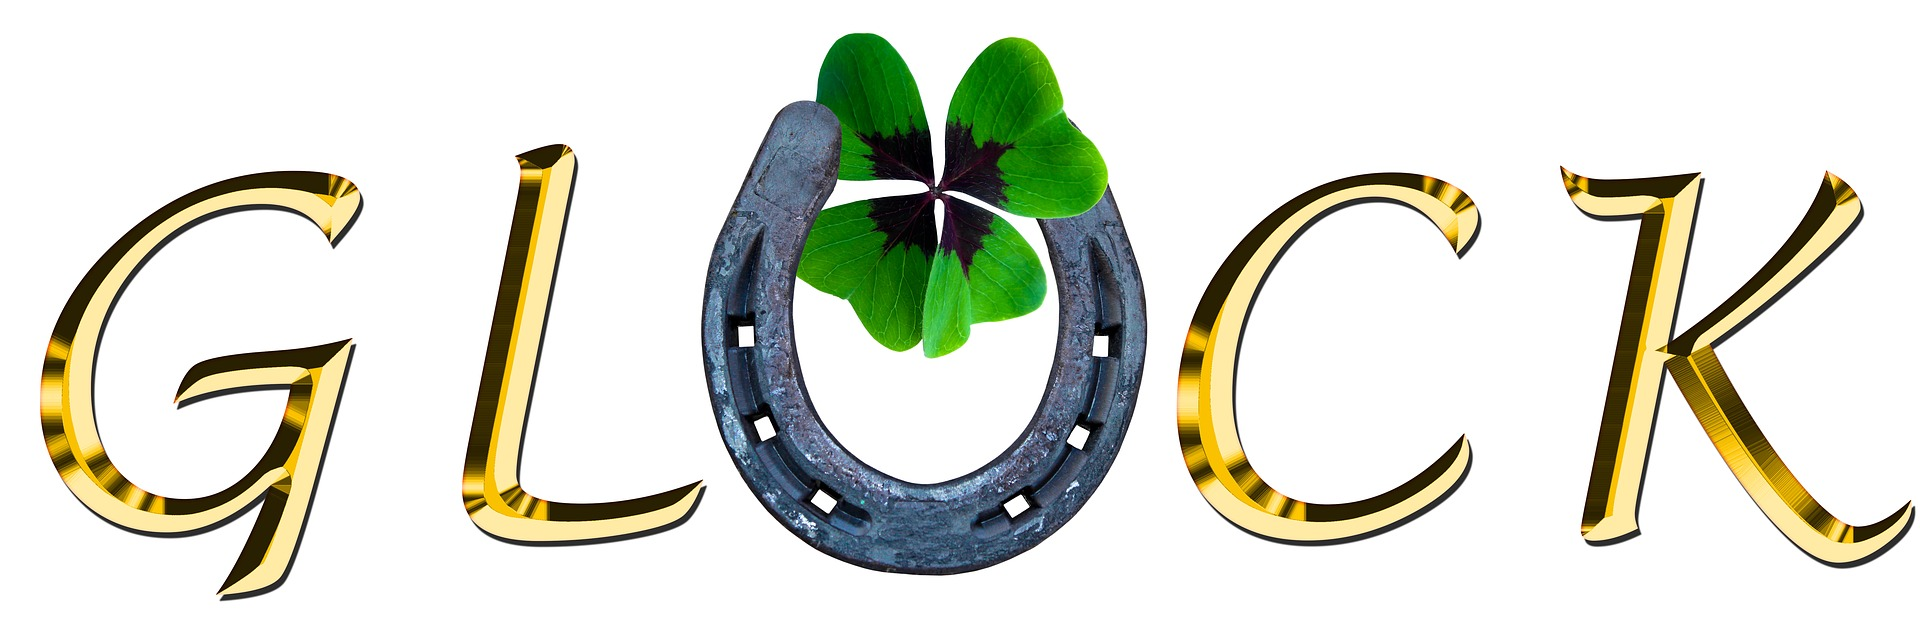 подкова - символ удачи